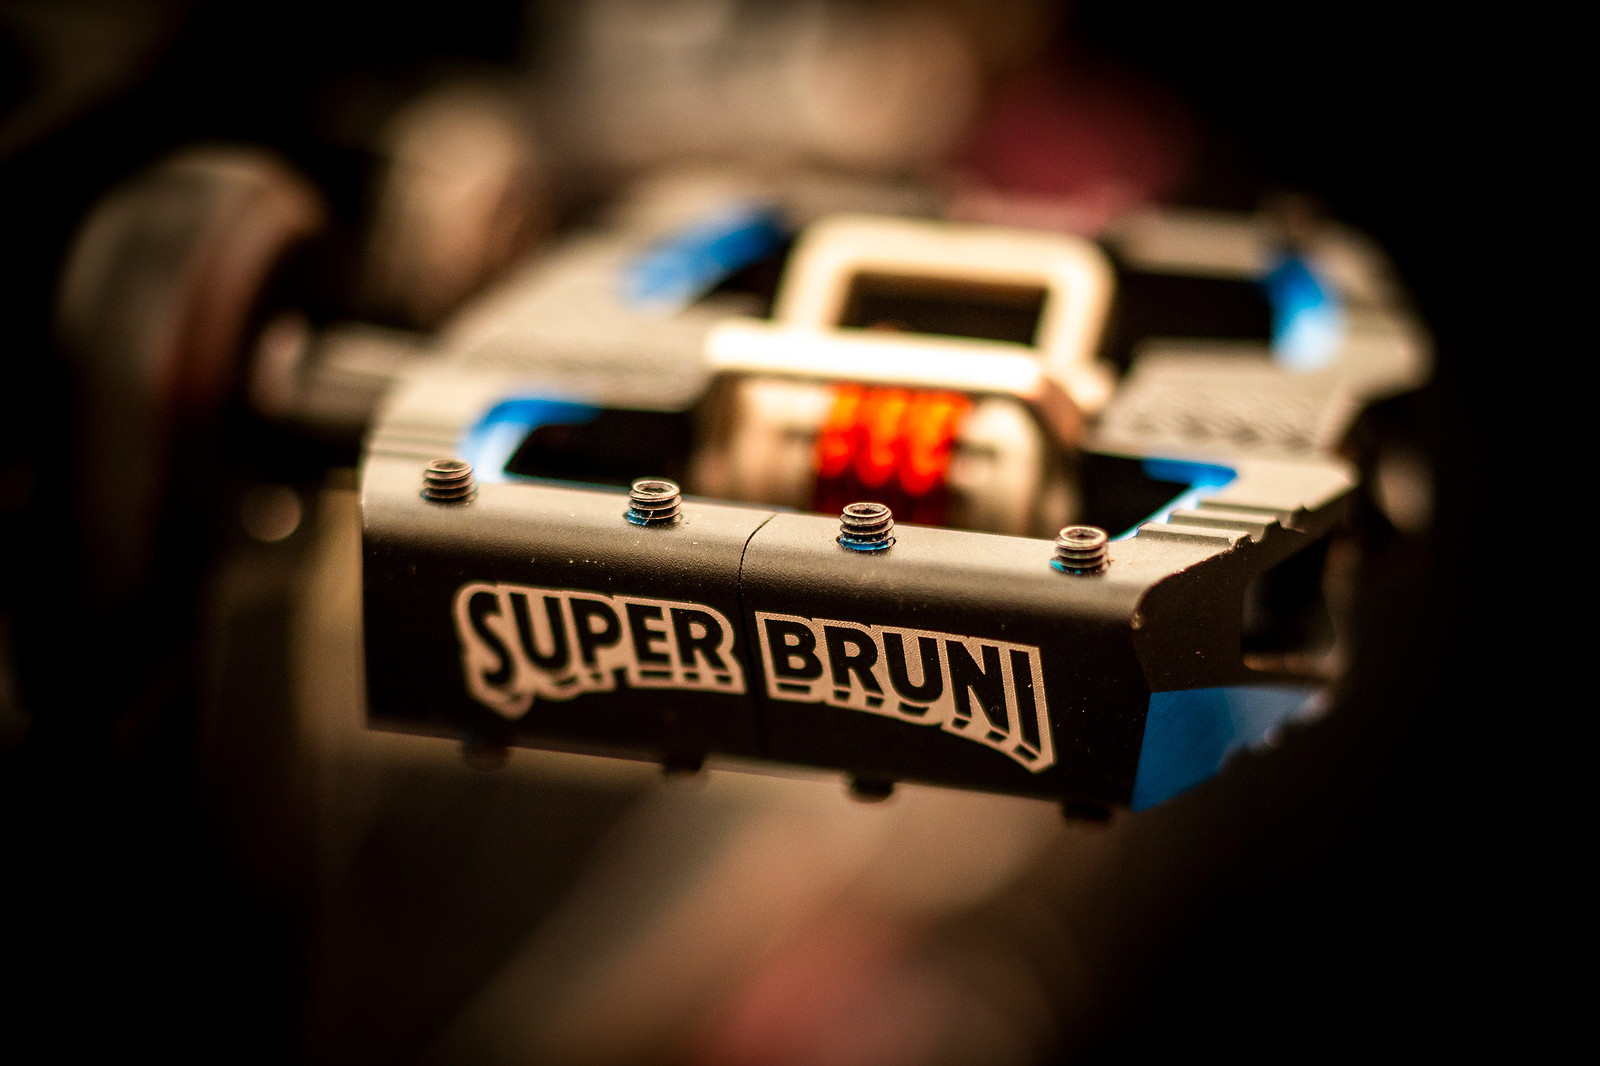 Super Bruni Crank Brothers Mallets - 2018 Losinj World Cup Pit Bits - Mountain Biking Pictures - Vital MTB